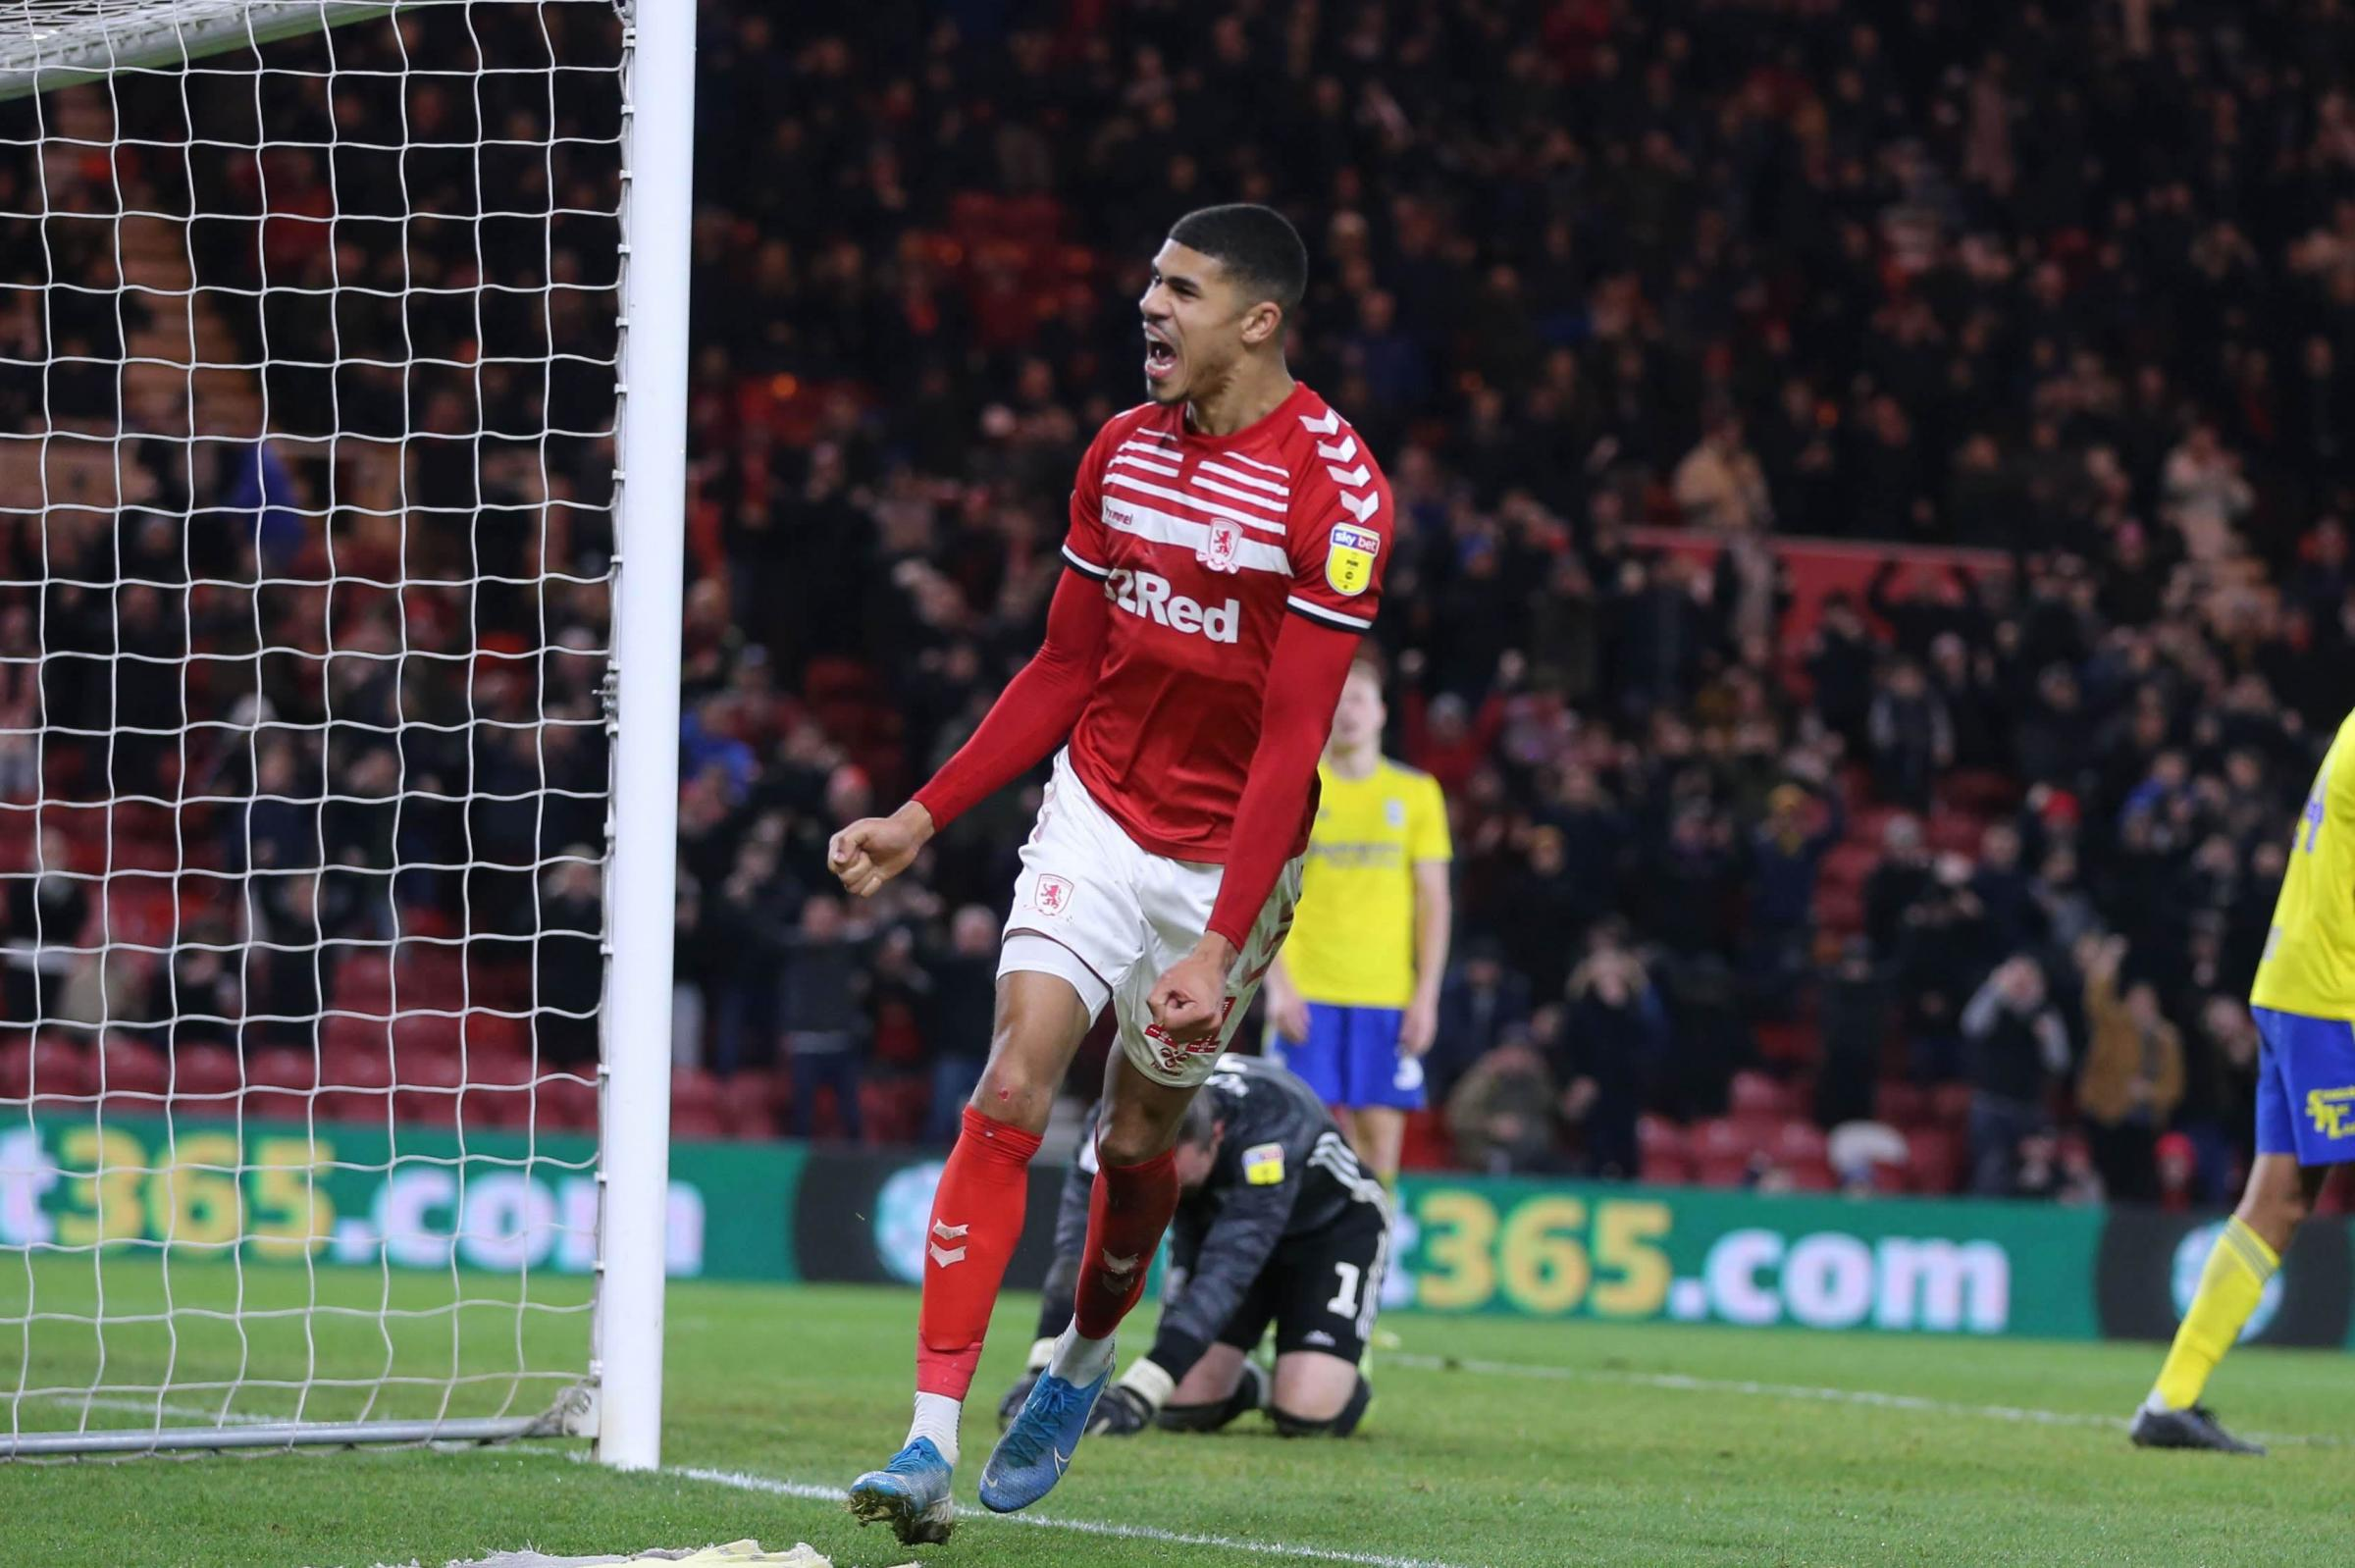 Ashley Fletcher establishes himself as Middlesbrough's main man